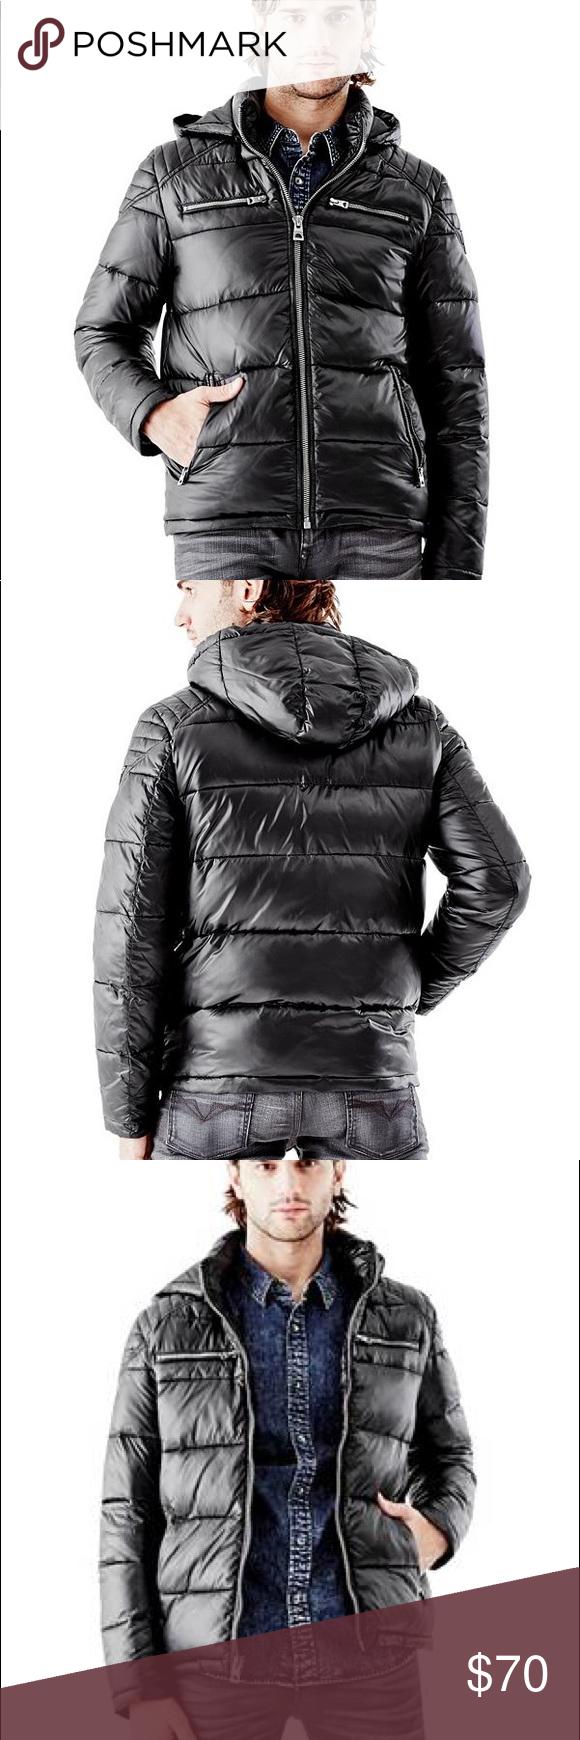 Guess Atlas Hooded Puffer Jacket Coat Black Mens L Black Coat Coats Jackets Jackets [ 1740 x 580 Pixel ]